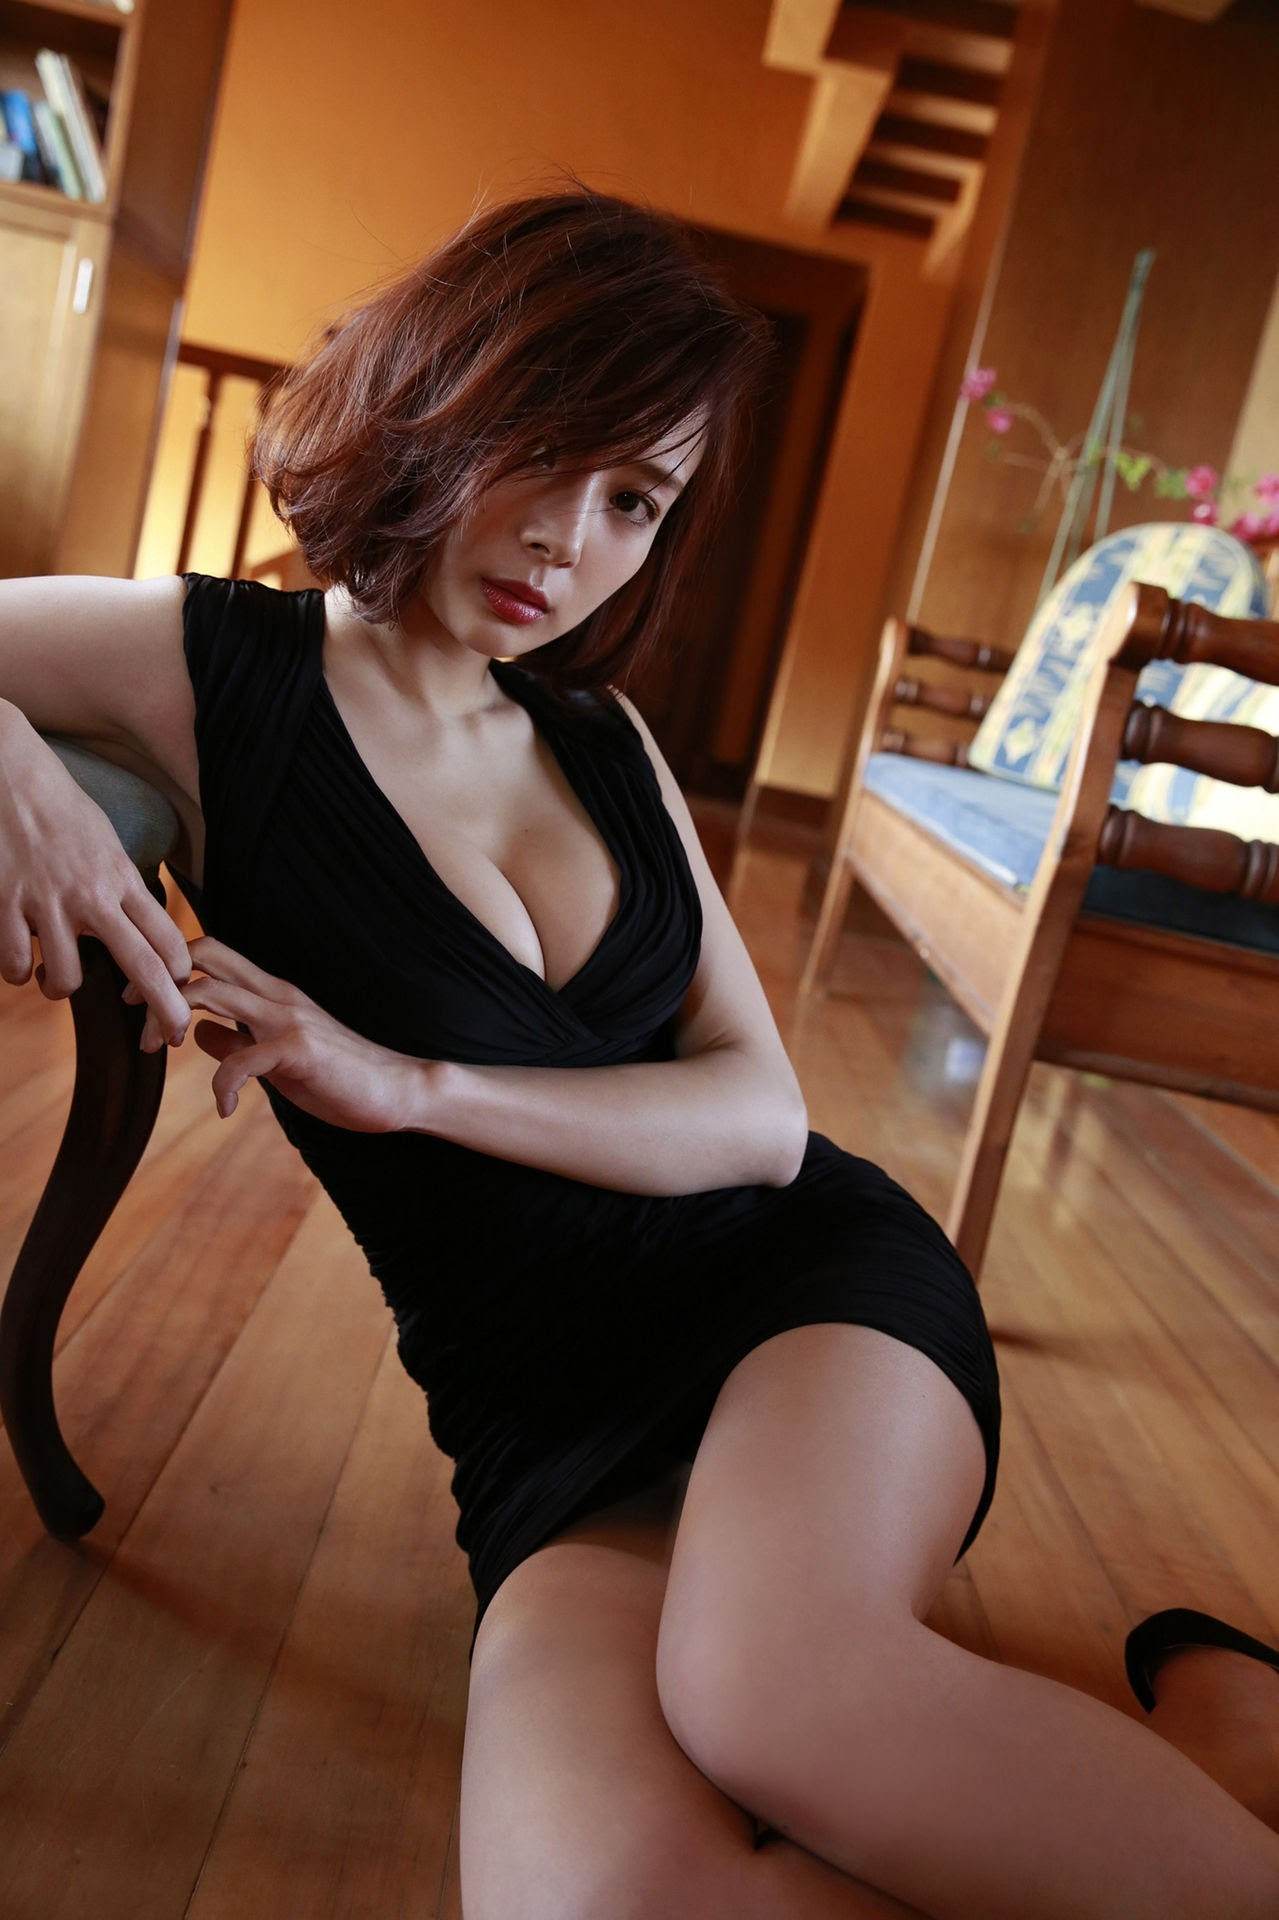 23 years old Shaka Okada, who is also a professional mahjong player055